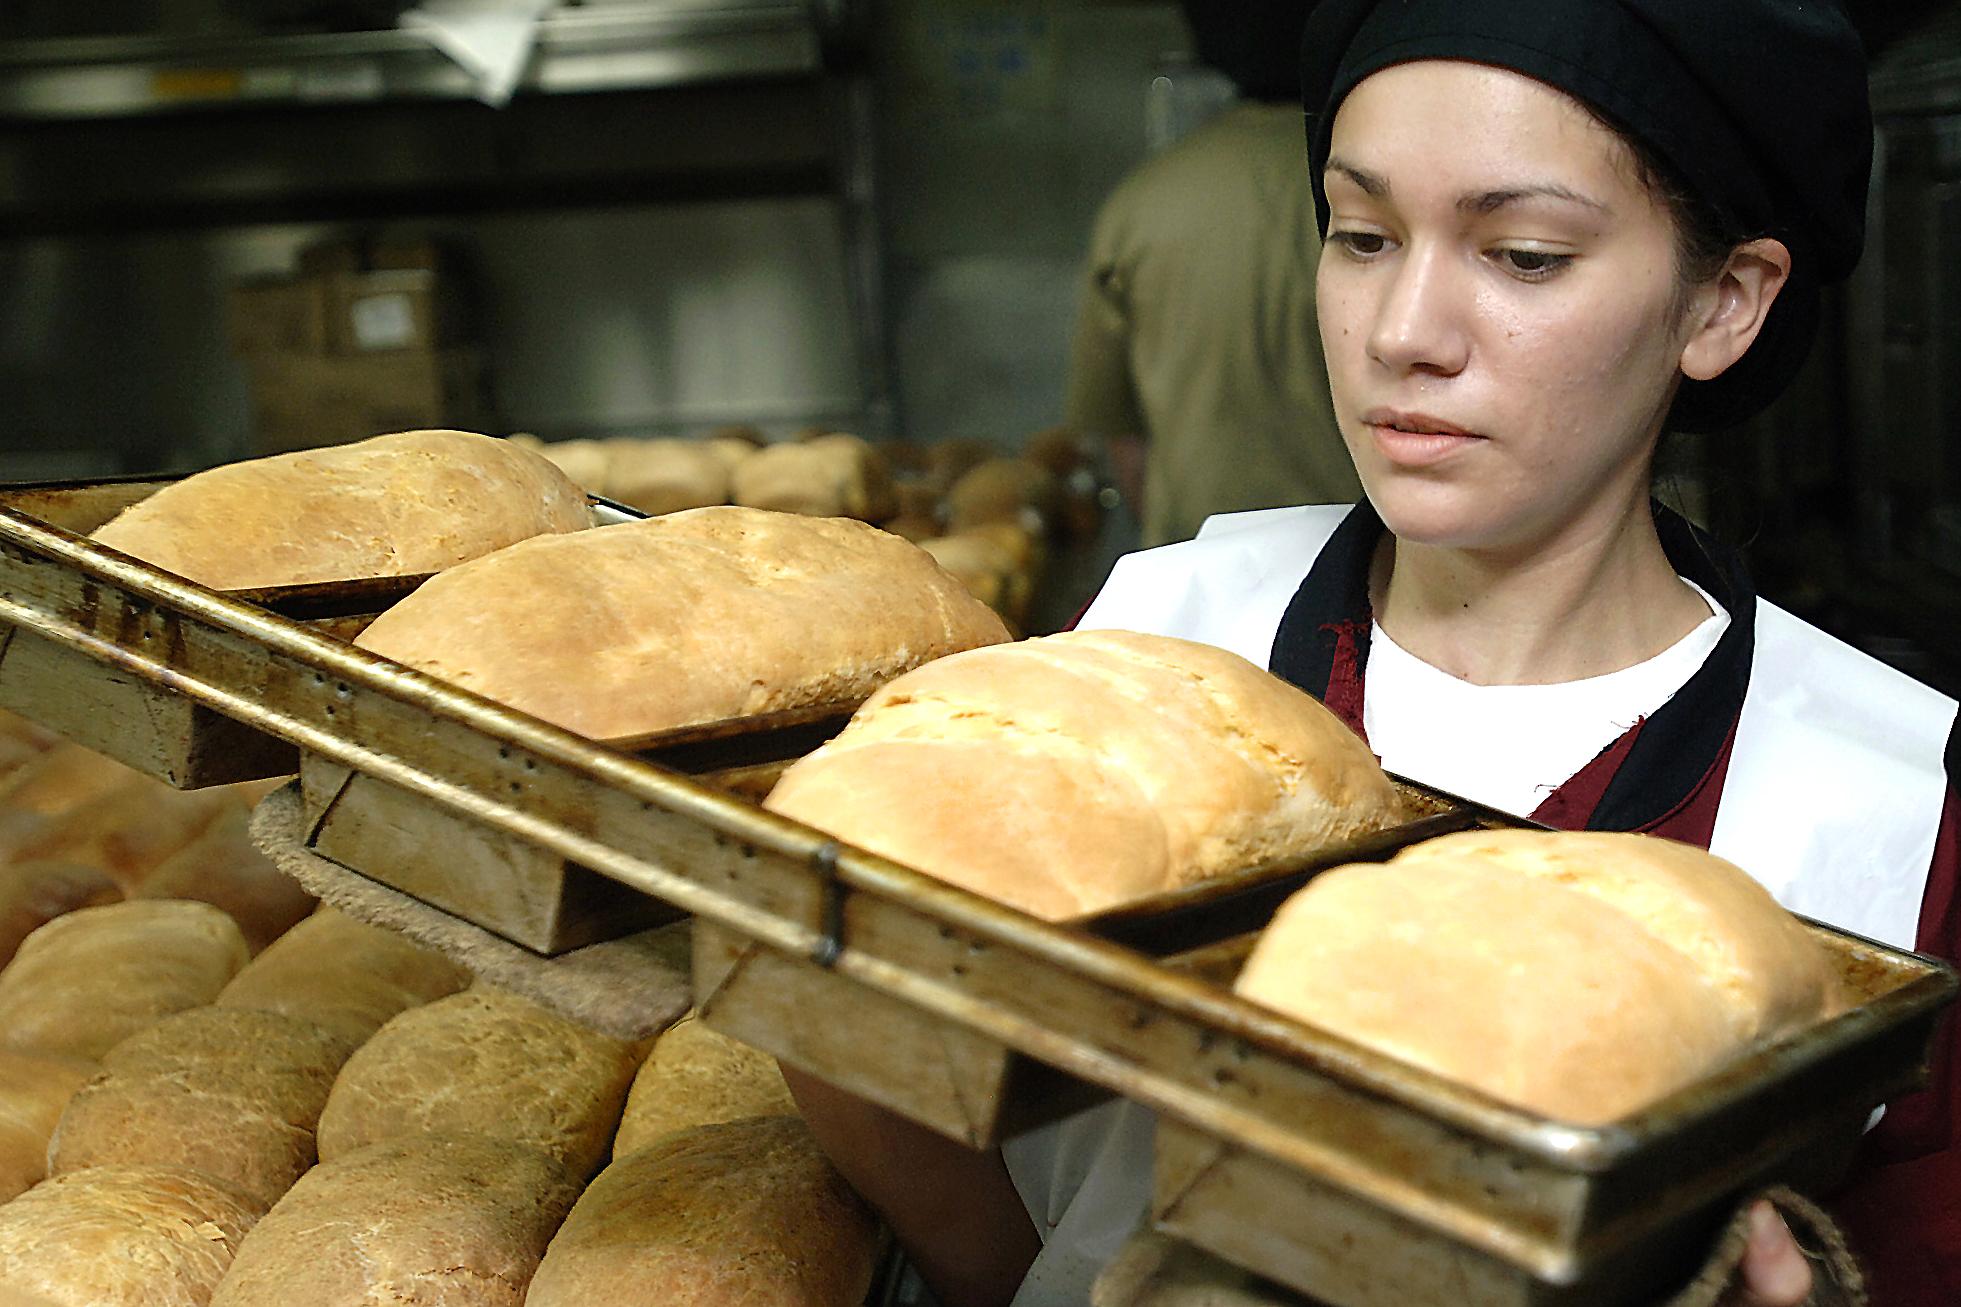 Baker clipart baking bread. Free public domain image